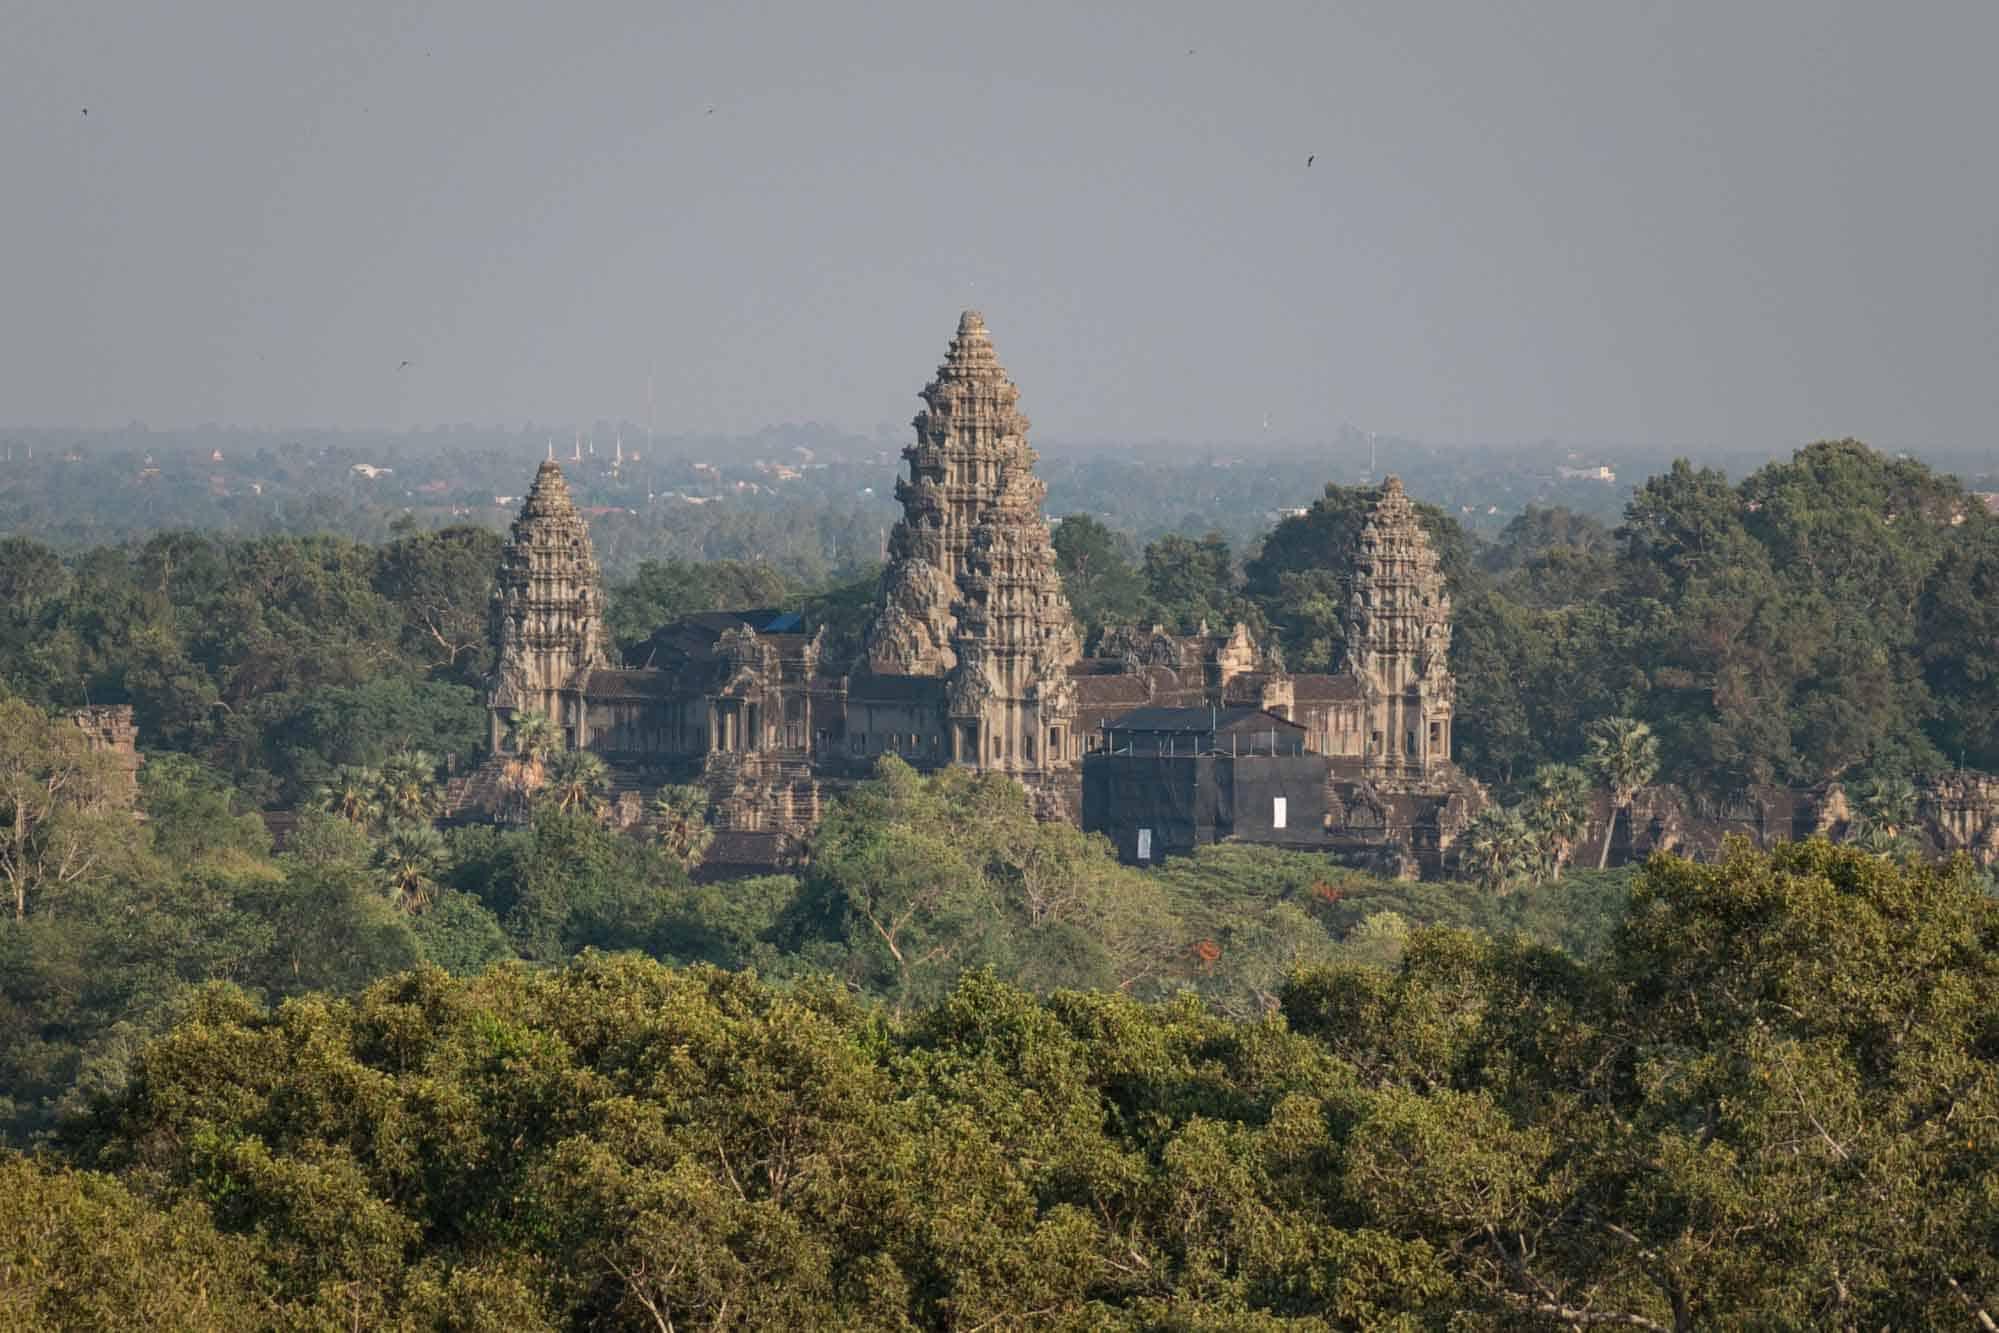 View of Angkor Wat from Phnom Bakeng